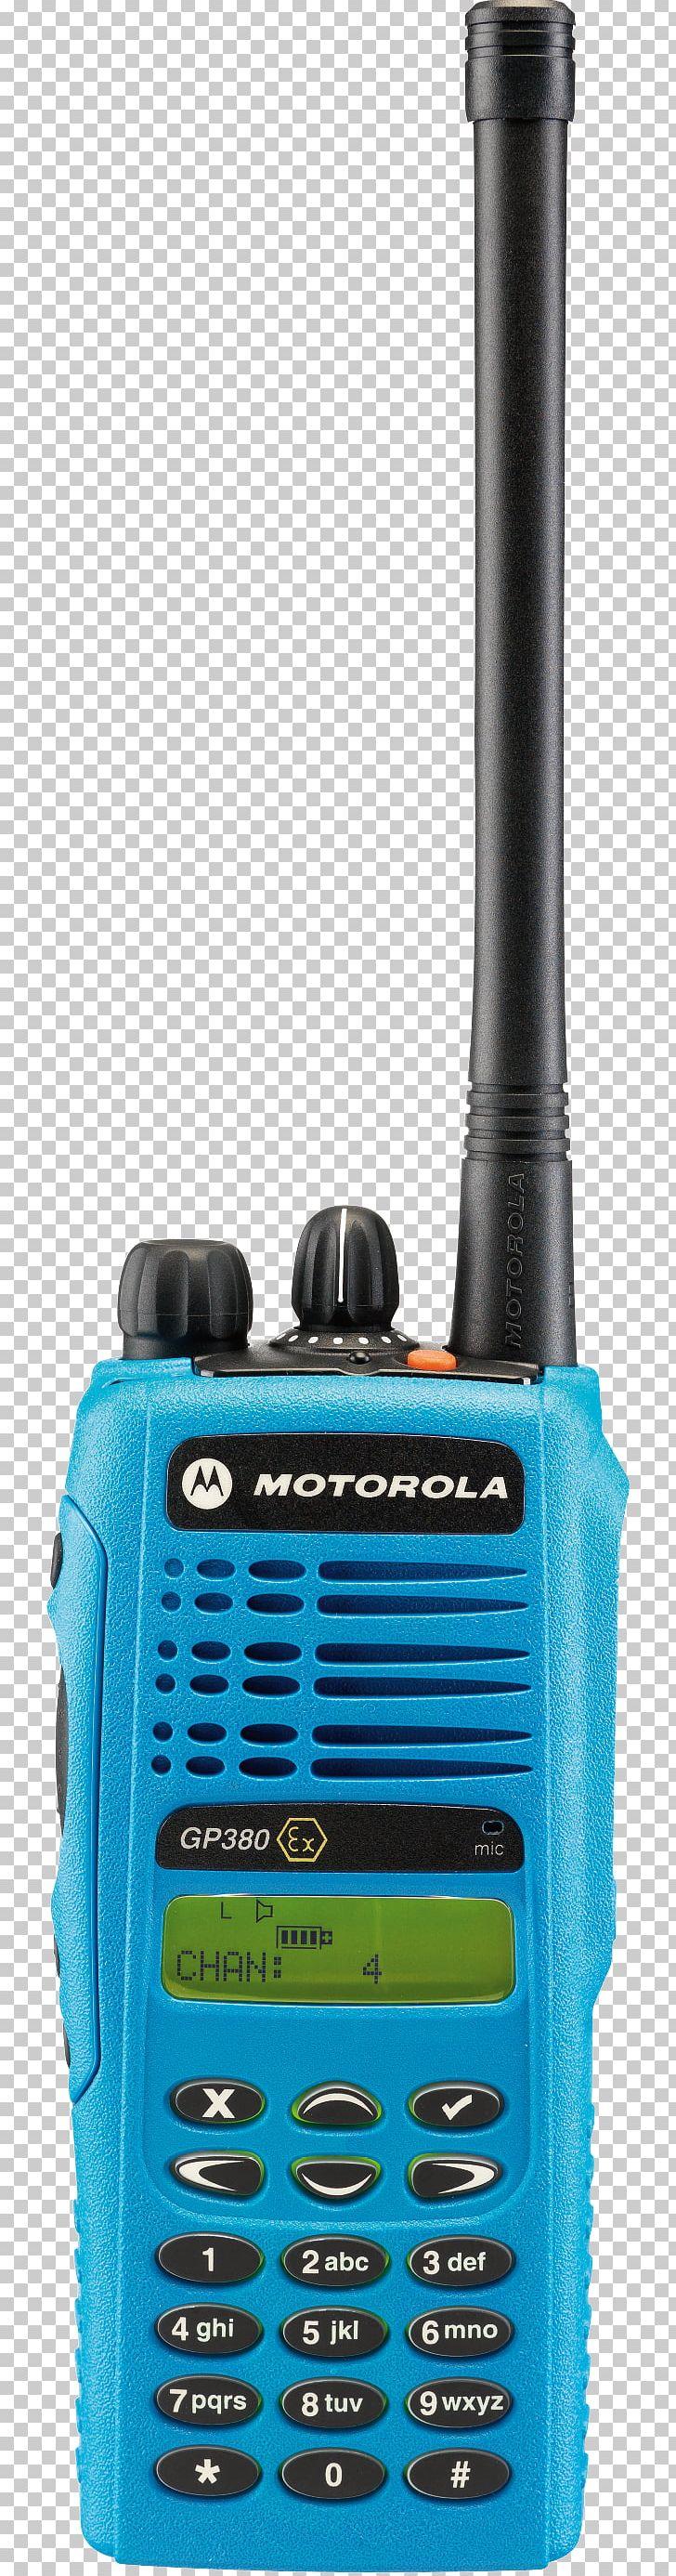 Walkie-talkie Two-way Radio Motorola بیسیم ATEX Directive PNG, Clipart, Analog Signal, Atex Directive, Barbar, Cylinder, Electric Blue Free PNG Download